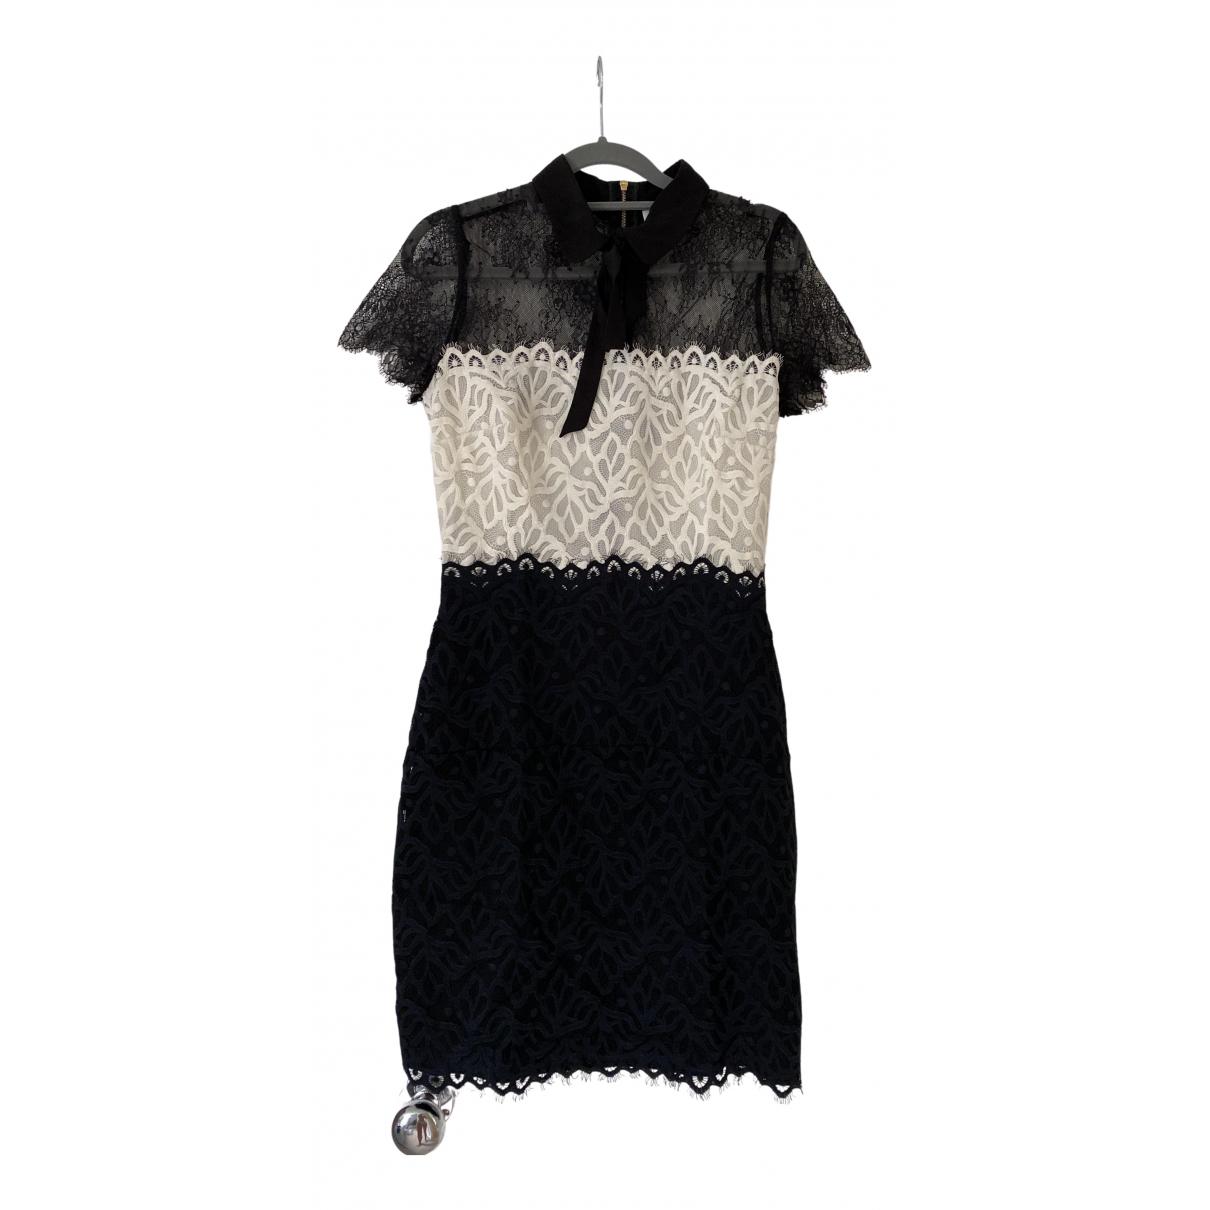 Sandro Fall Winter 2019 Black Lace dress for Women 2 0-5